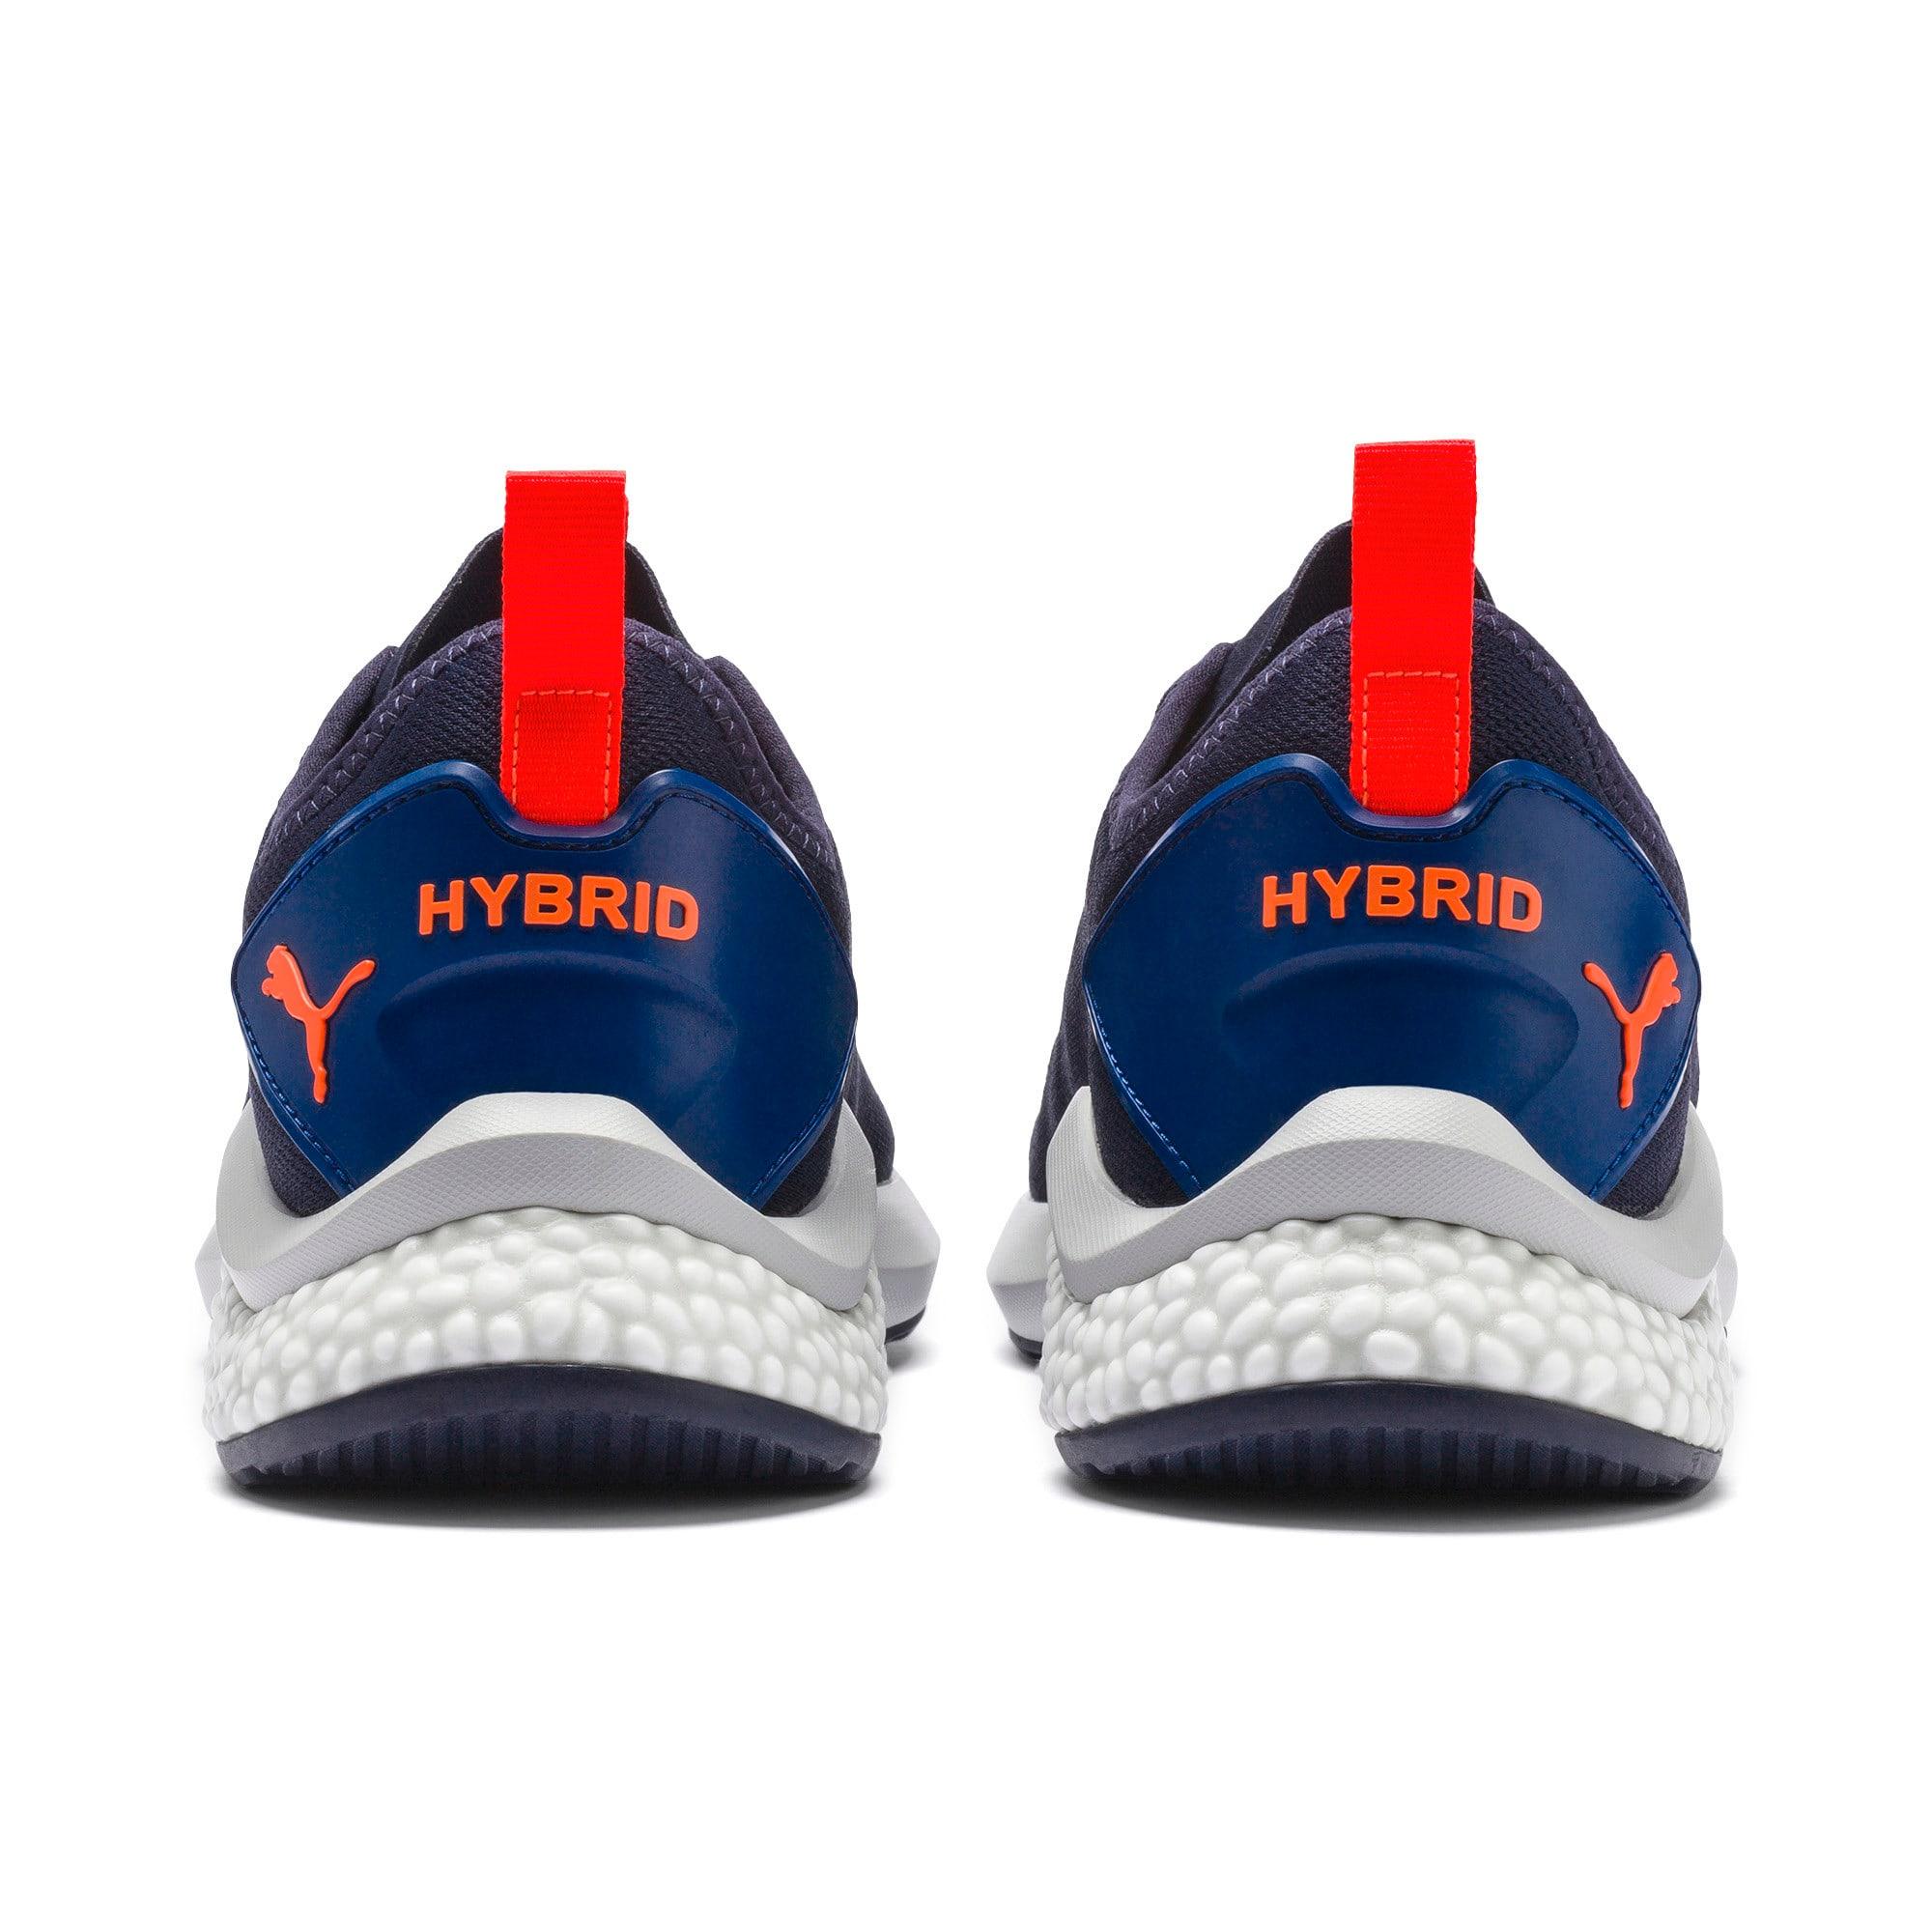 Thumbnail 5 of HYBRID NX Camo Men's Running Shoes, GalaxyBlue-Peacoat-HighRise, medium